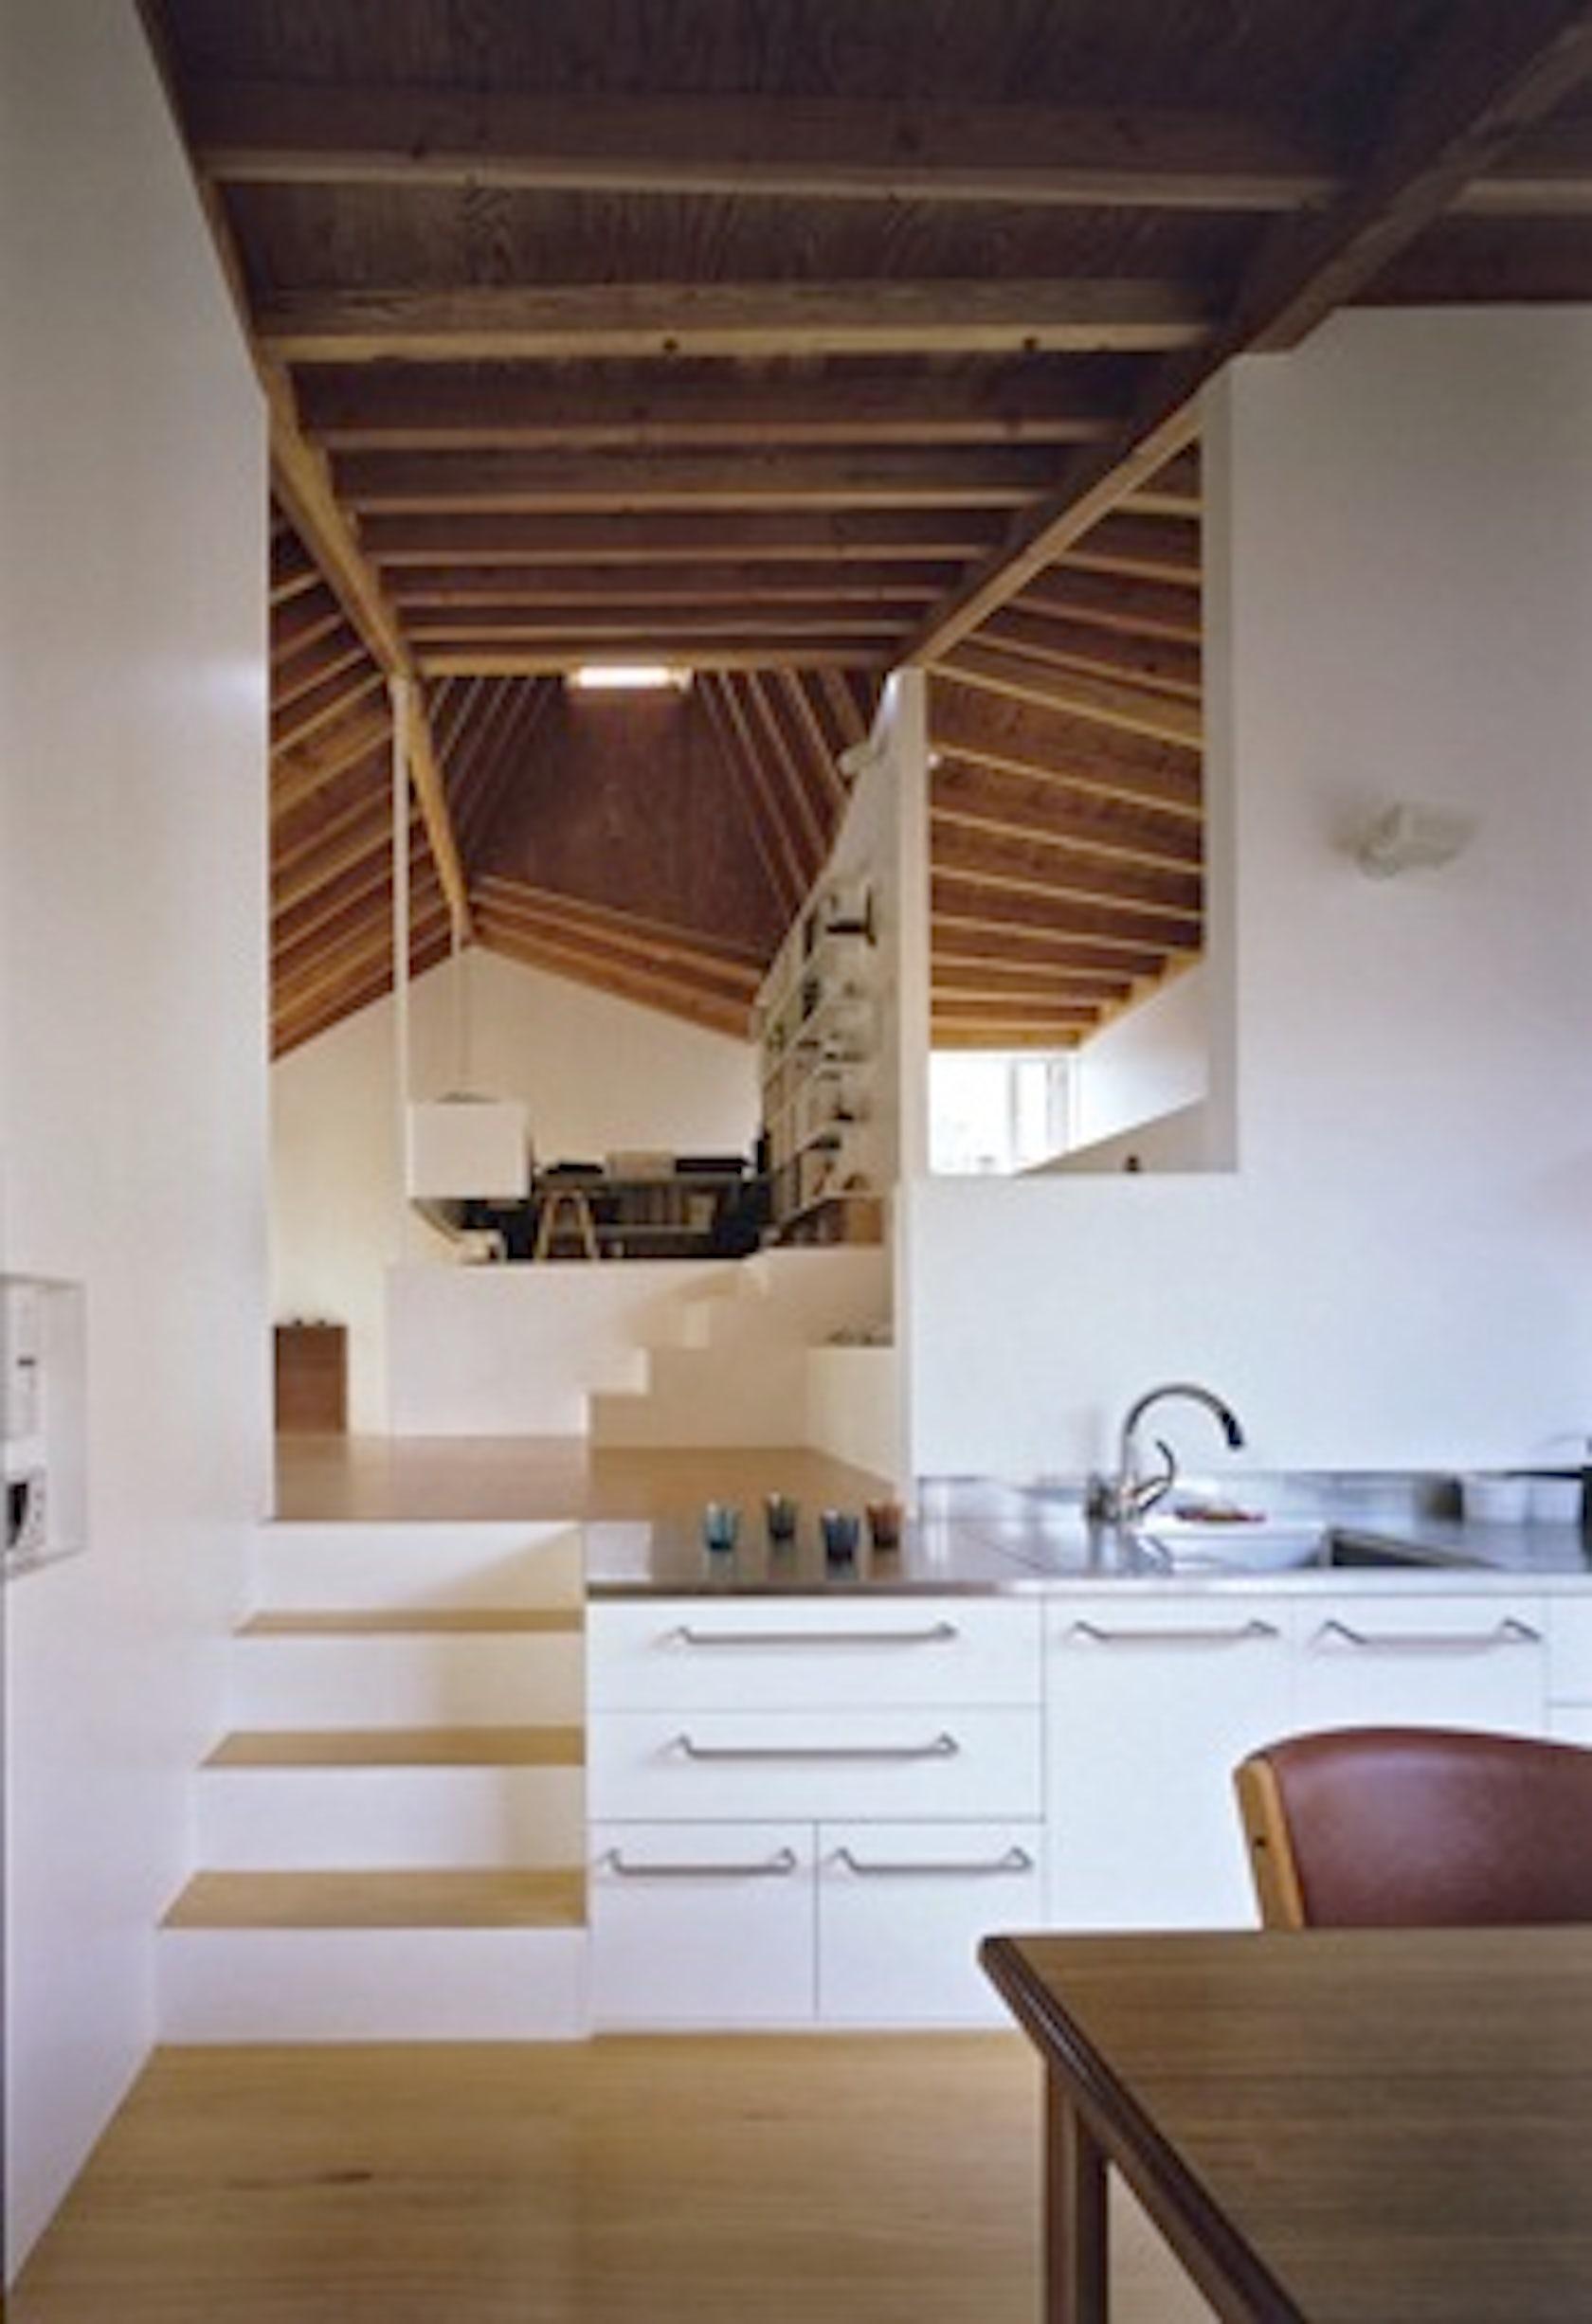 BMW Mountain View >> Nora House - Architizer